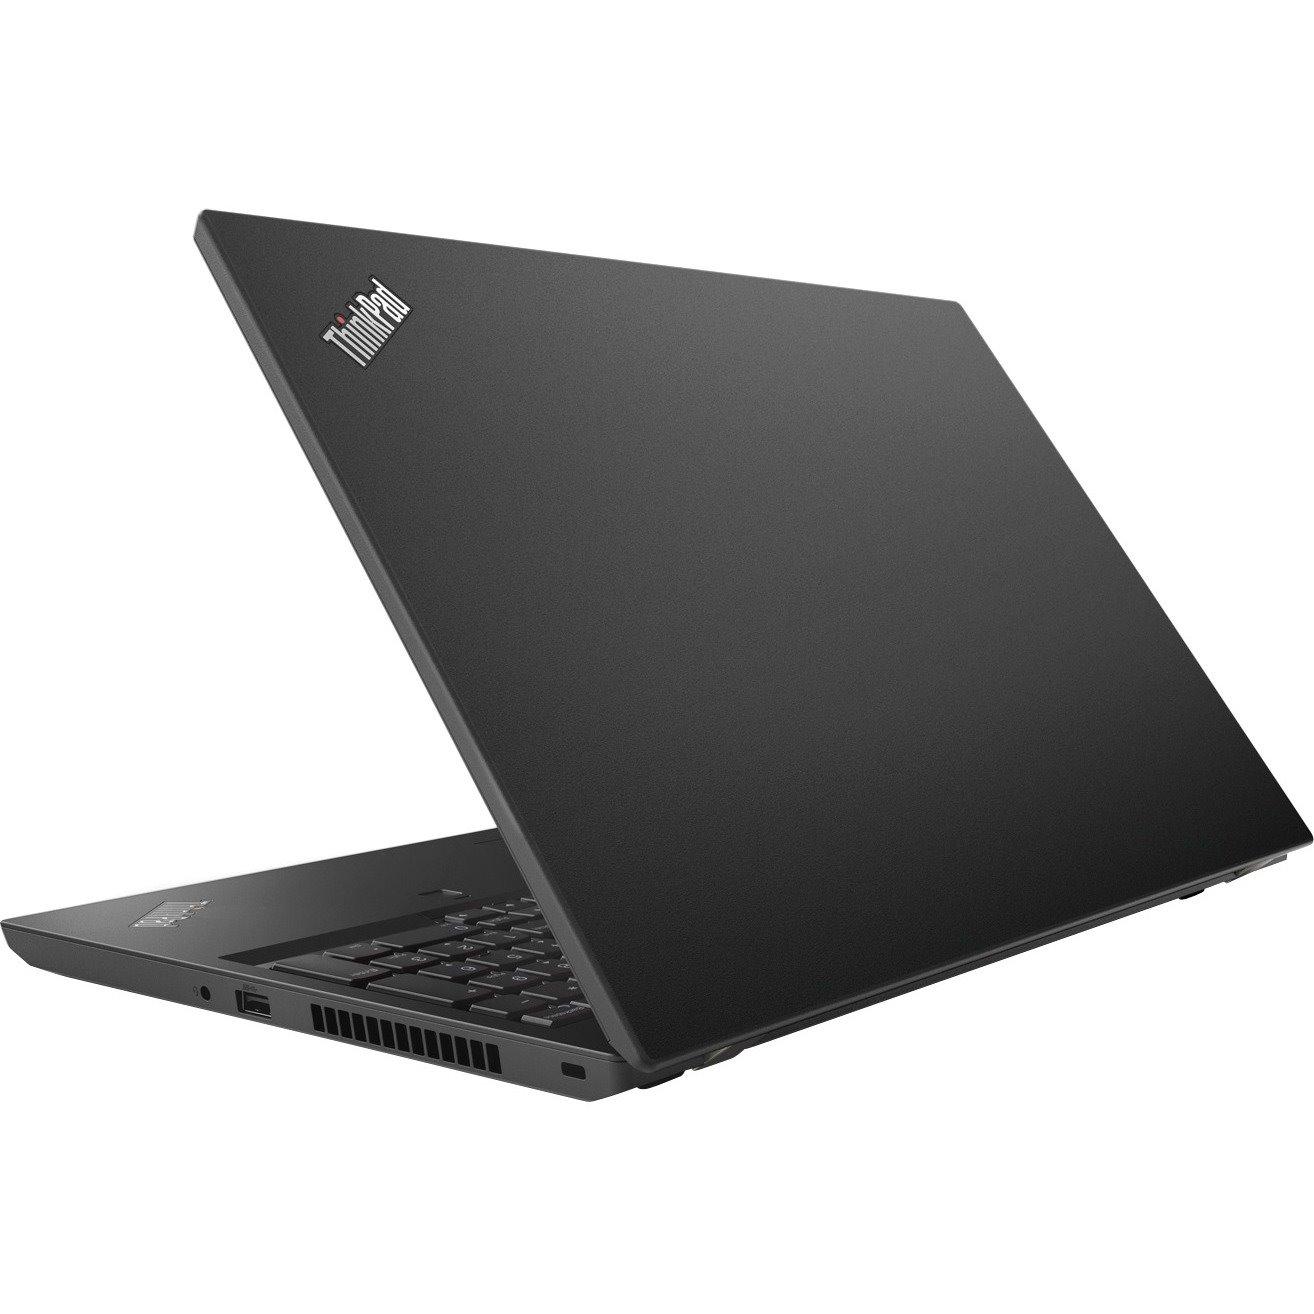 "Lenovo ThinkPad L580 20LW002FAU 39.6 cm (15.6"") LCD Notebook - Intel Core i7 (8th Gen) i7-8550U Quad-core (4 Core) 1.80 GHz - 8 GB DDR4 SDRAM - 256 GB SSD - Windows 10 Pro 64-bit - 1920 x 1080 - In-plane Switching (IPS) Technology - Graphite Black"